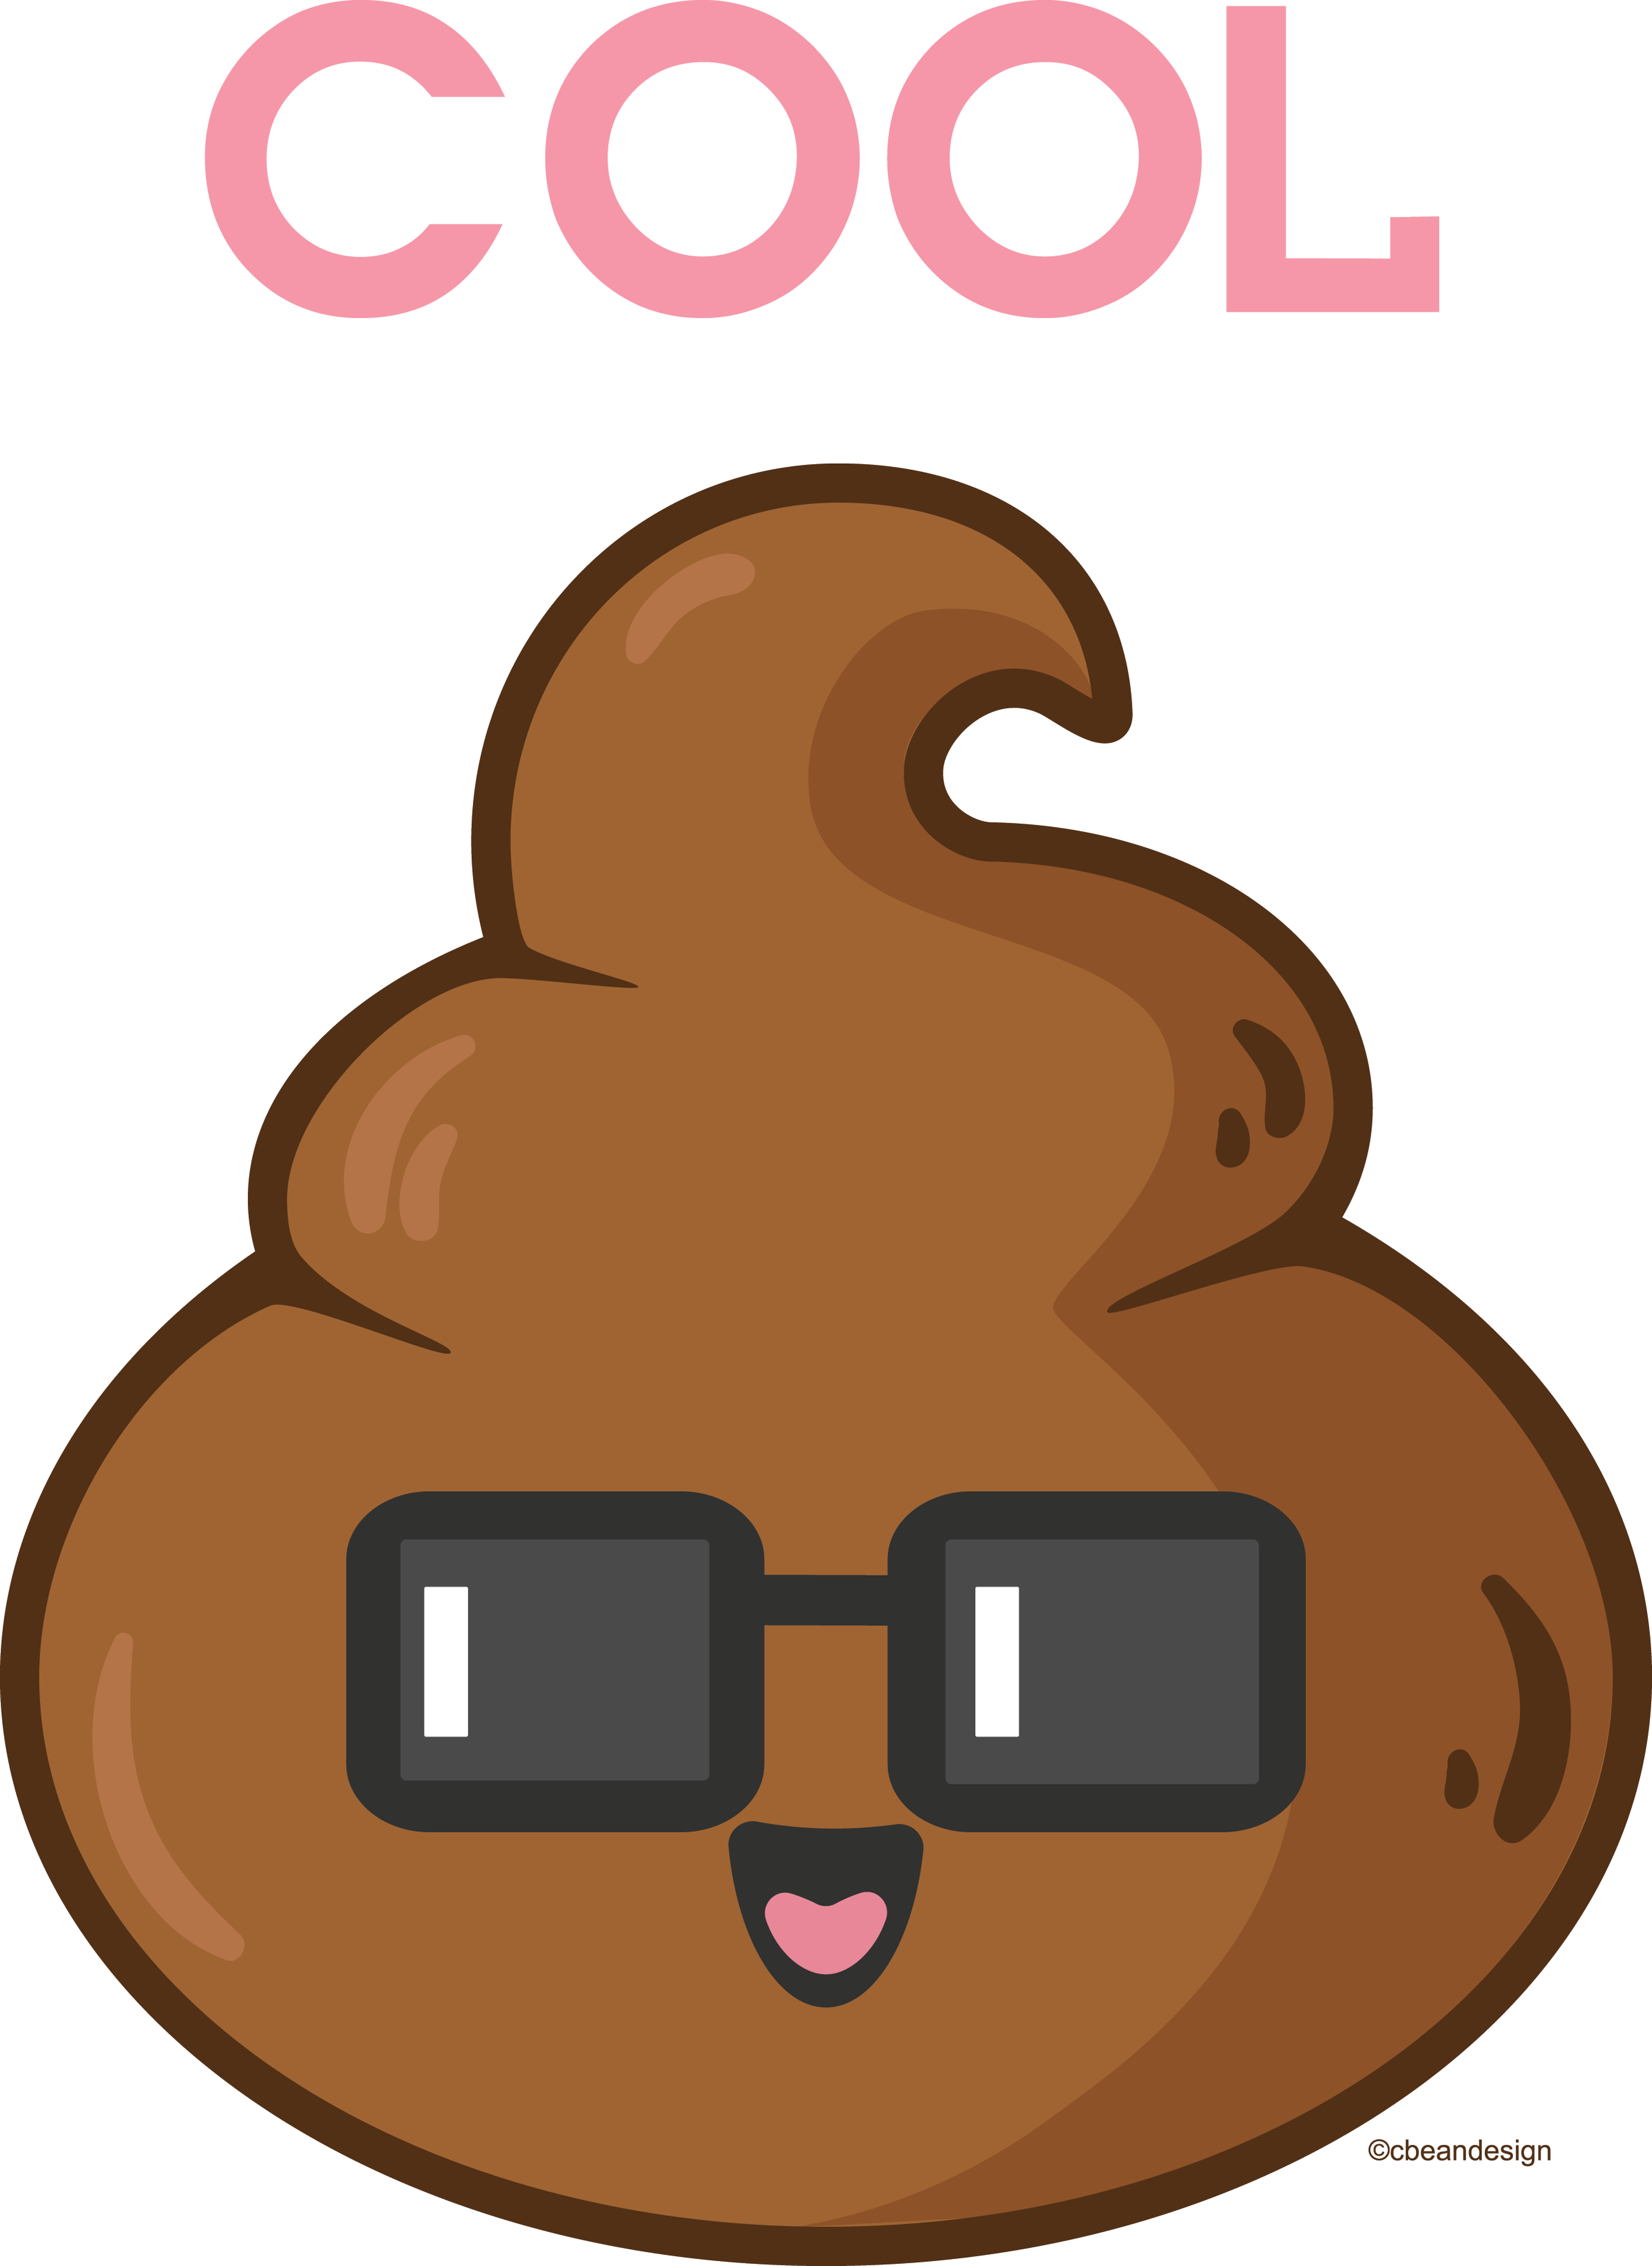 Poop emoji person